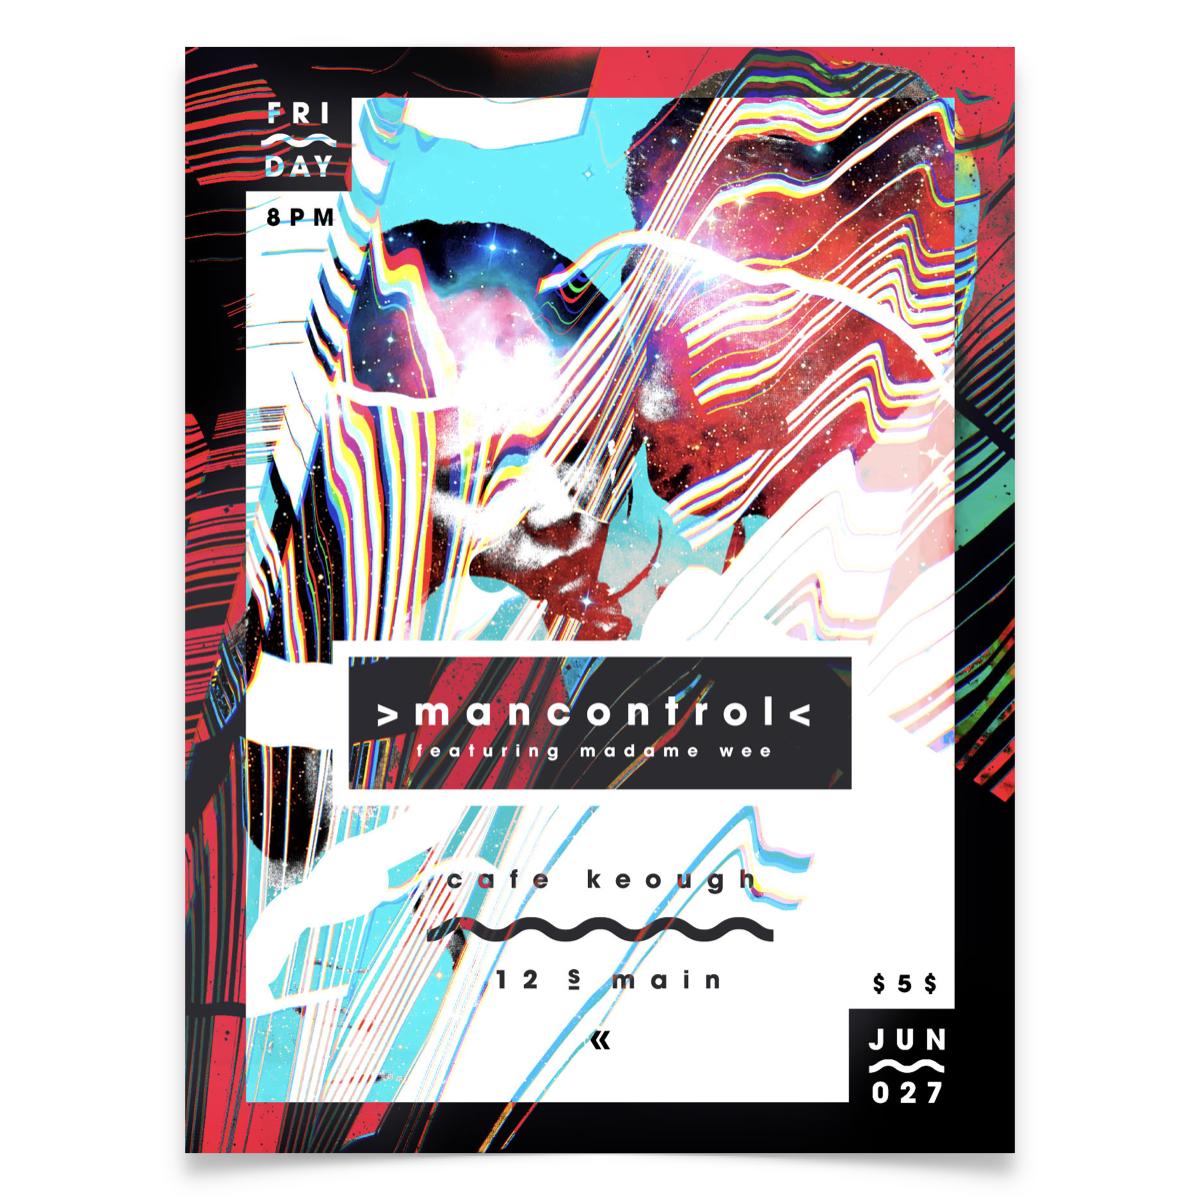 SFER-Posters-MC-1.jpeg